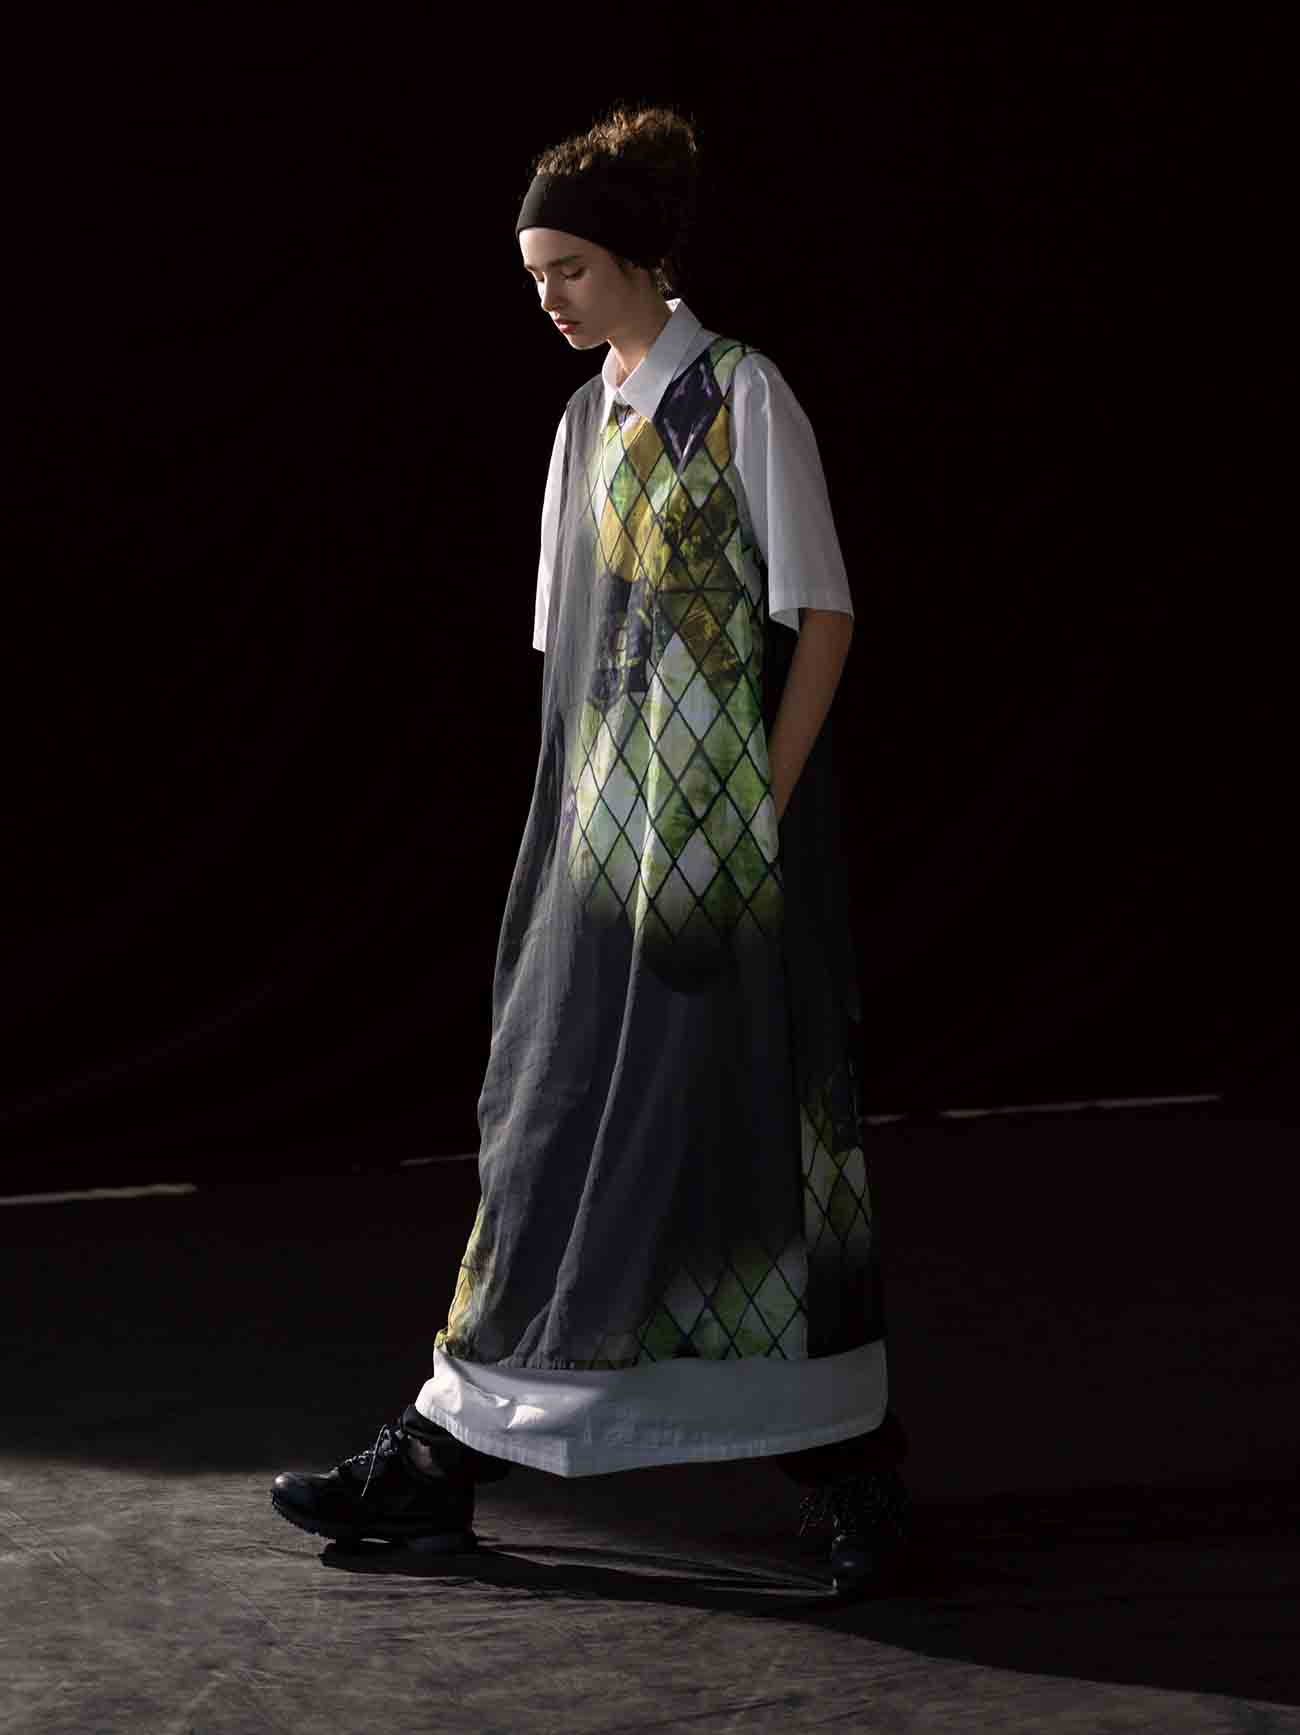 C/BOYLE DIAMOND STAINED GLASS ASYMME SLEEVELESS DRESS